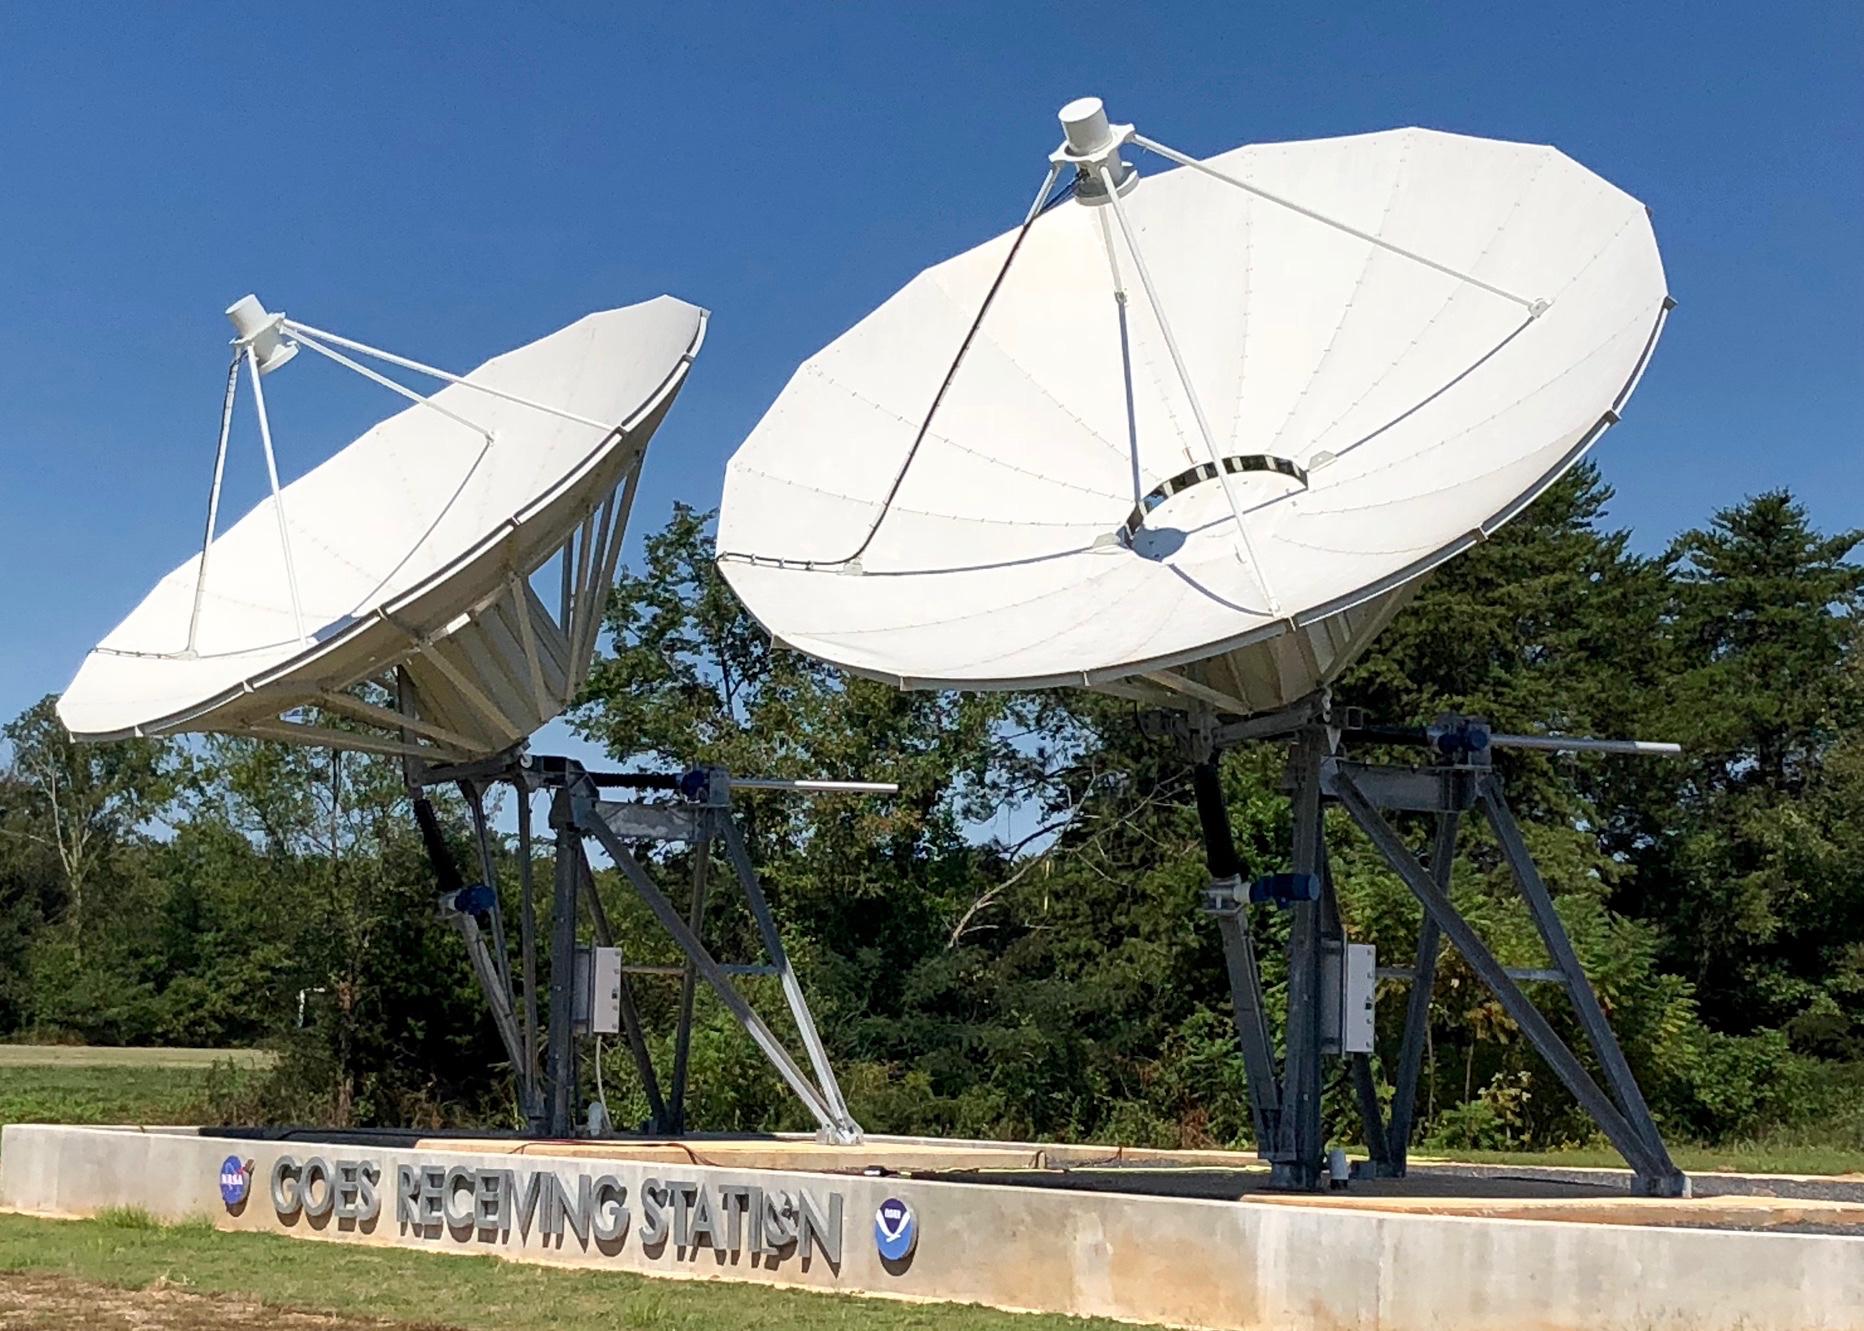 NASA Marshall Invites Media to View Weather Satellite